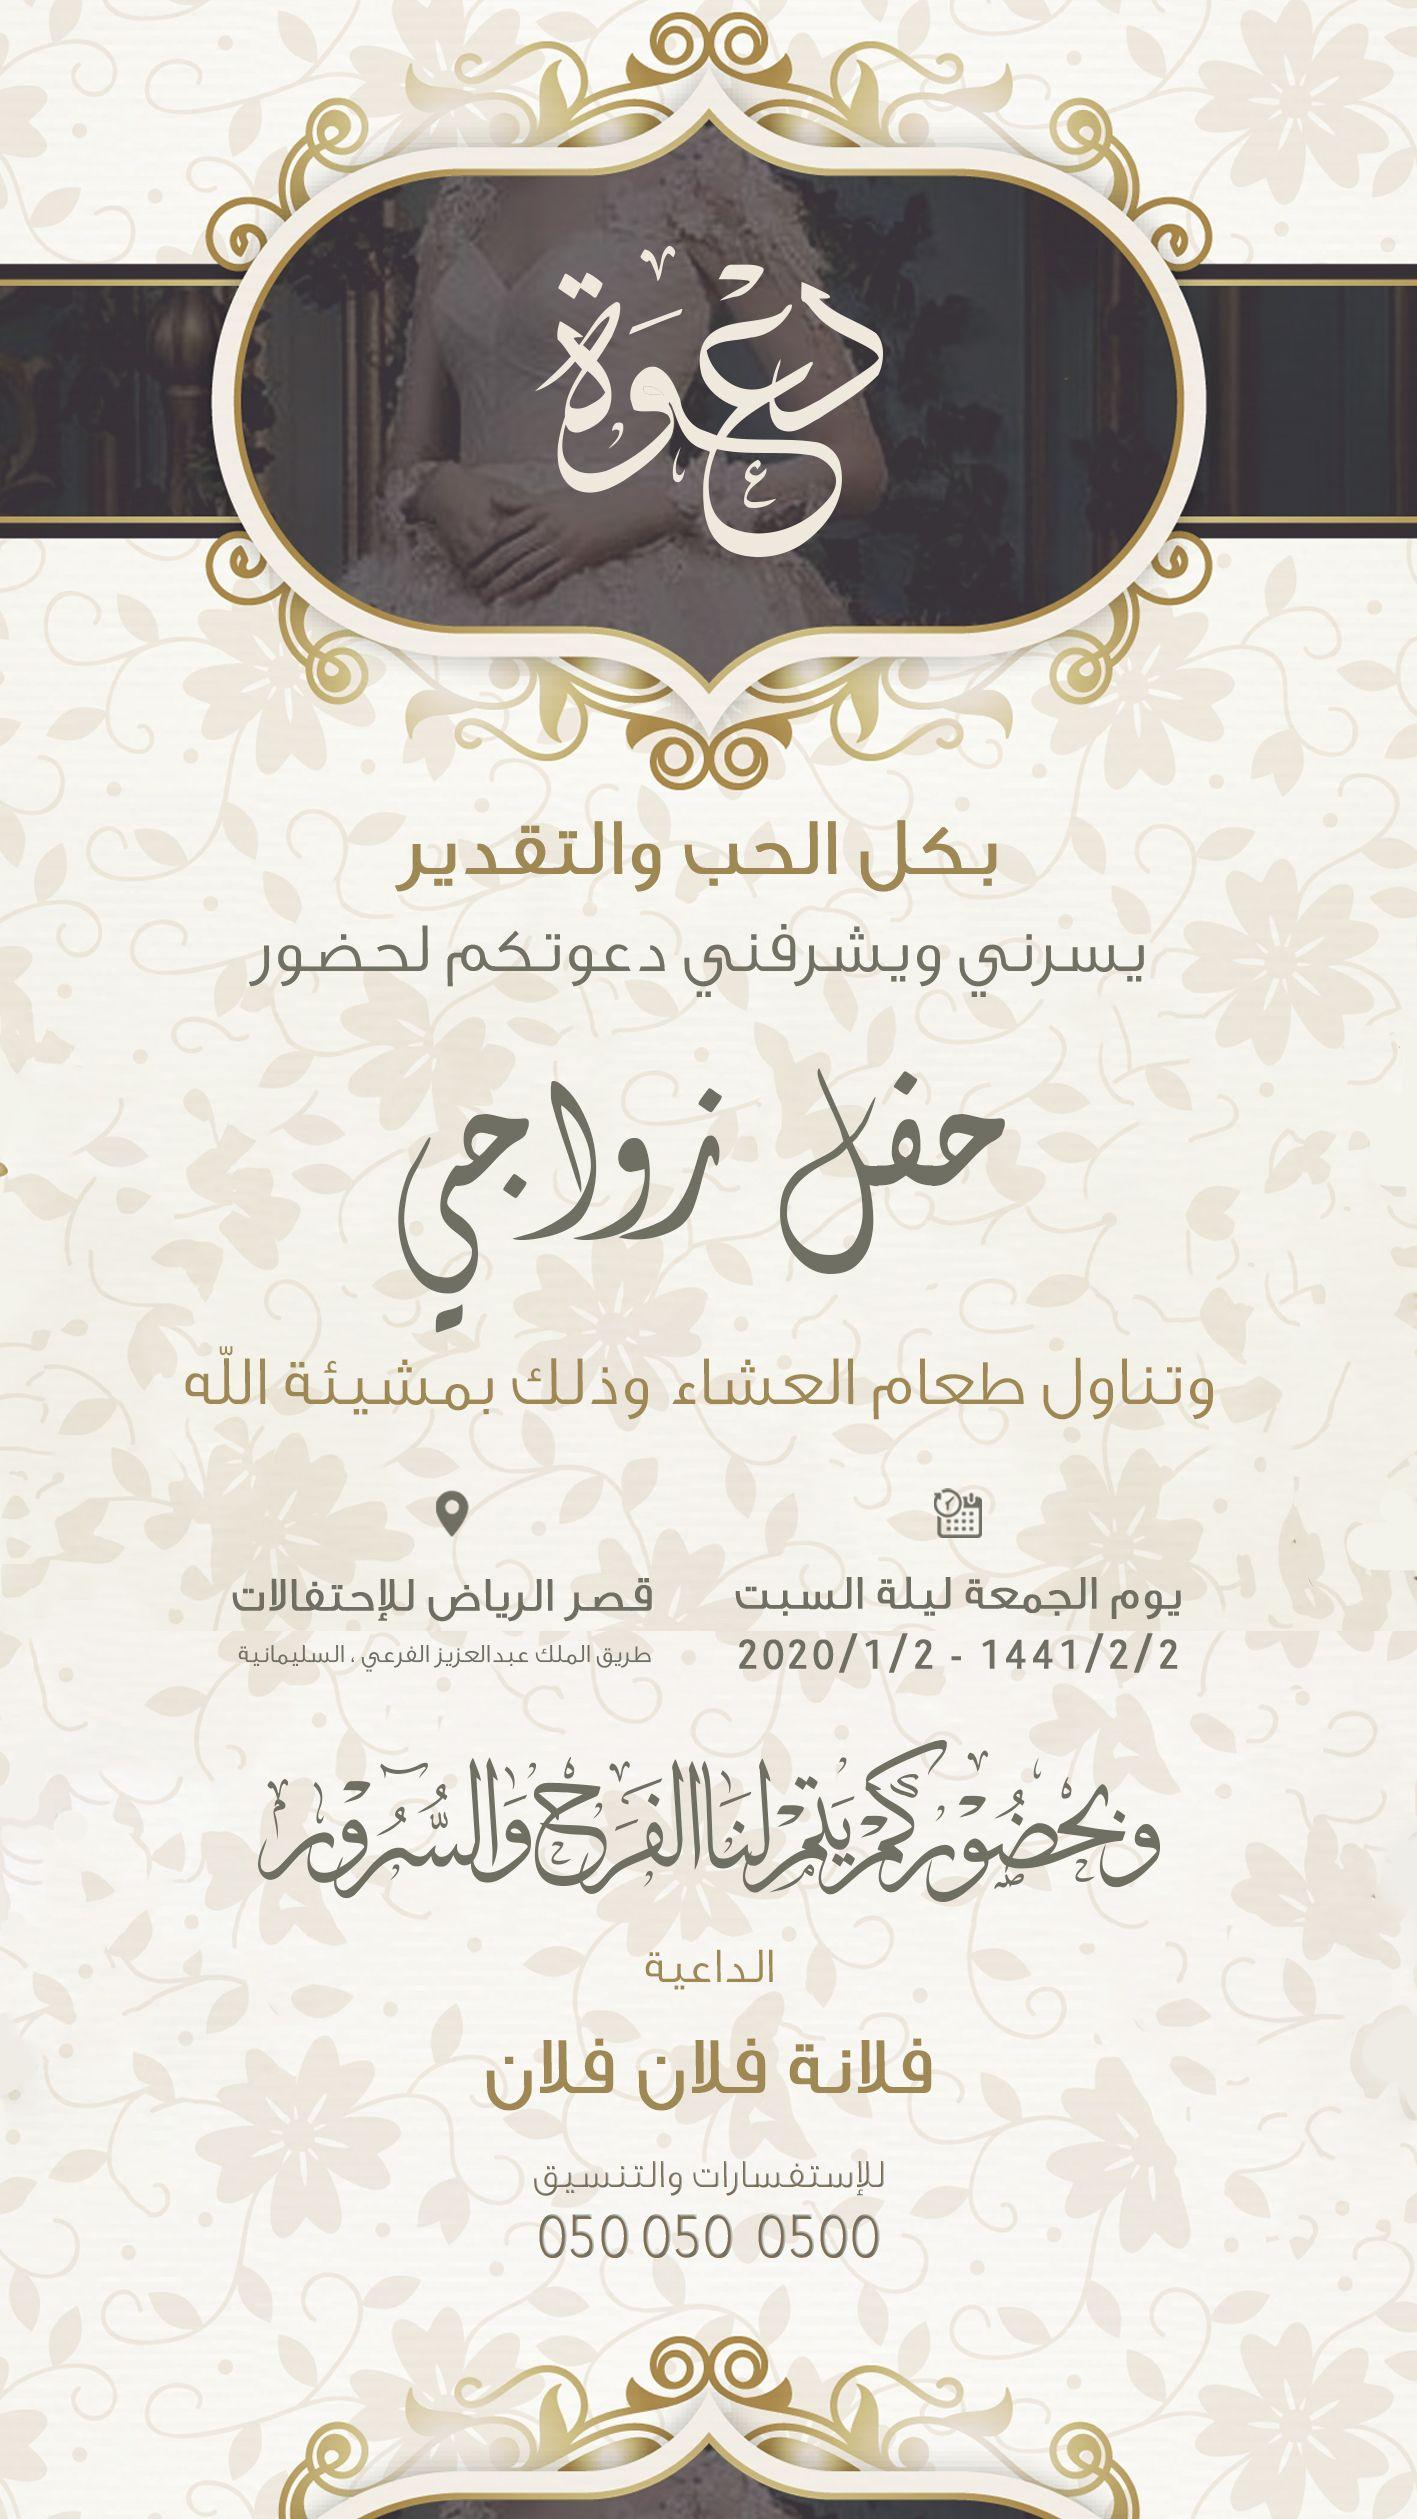 دعوة زواج 16 Floral Logo Design Wedding Invitation Posters Instagram Design